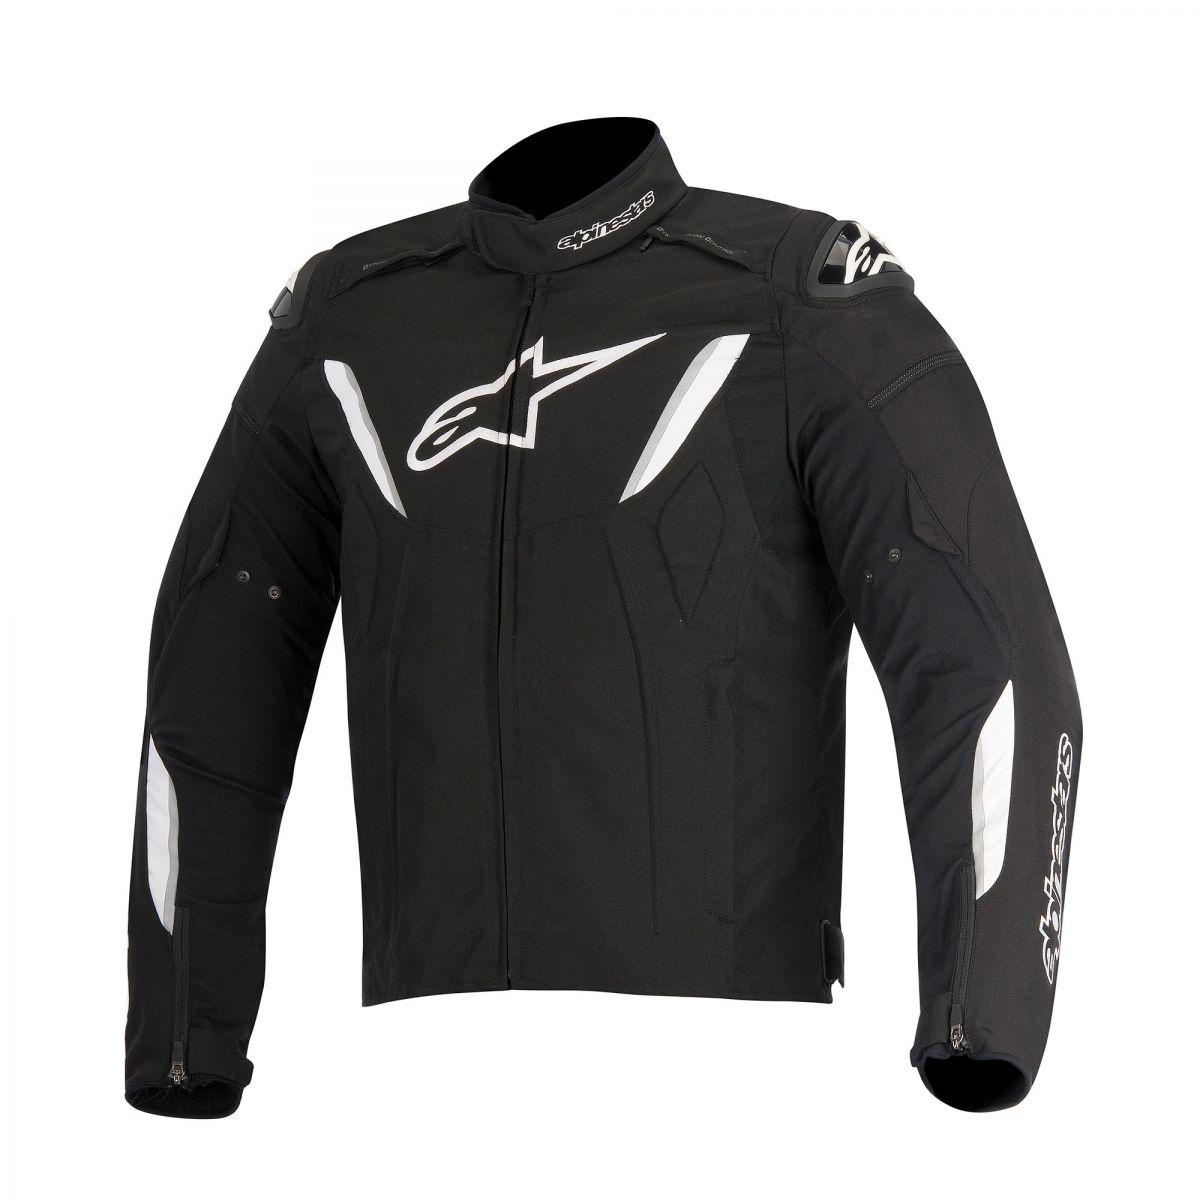 Jaqueta Alpinestars T GP R WP (Black White/ Impermeável) NOVO  - Super Bike - Loja Oficial Alpinestars